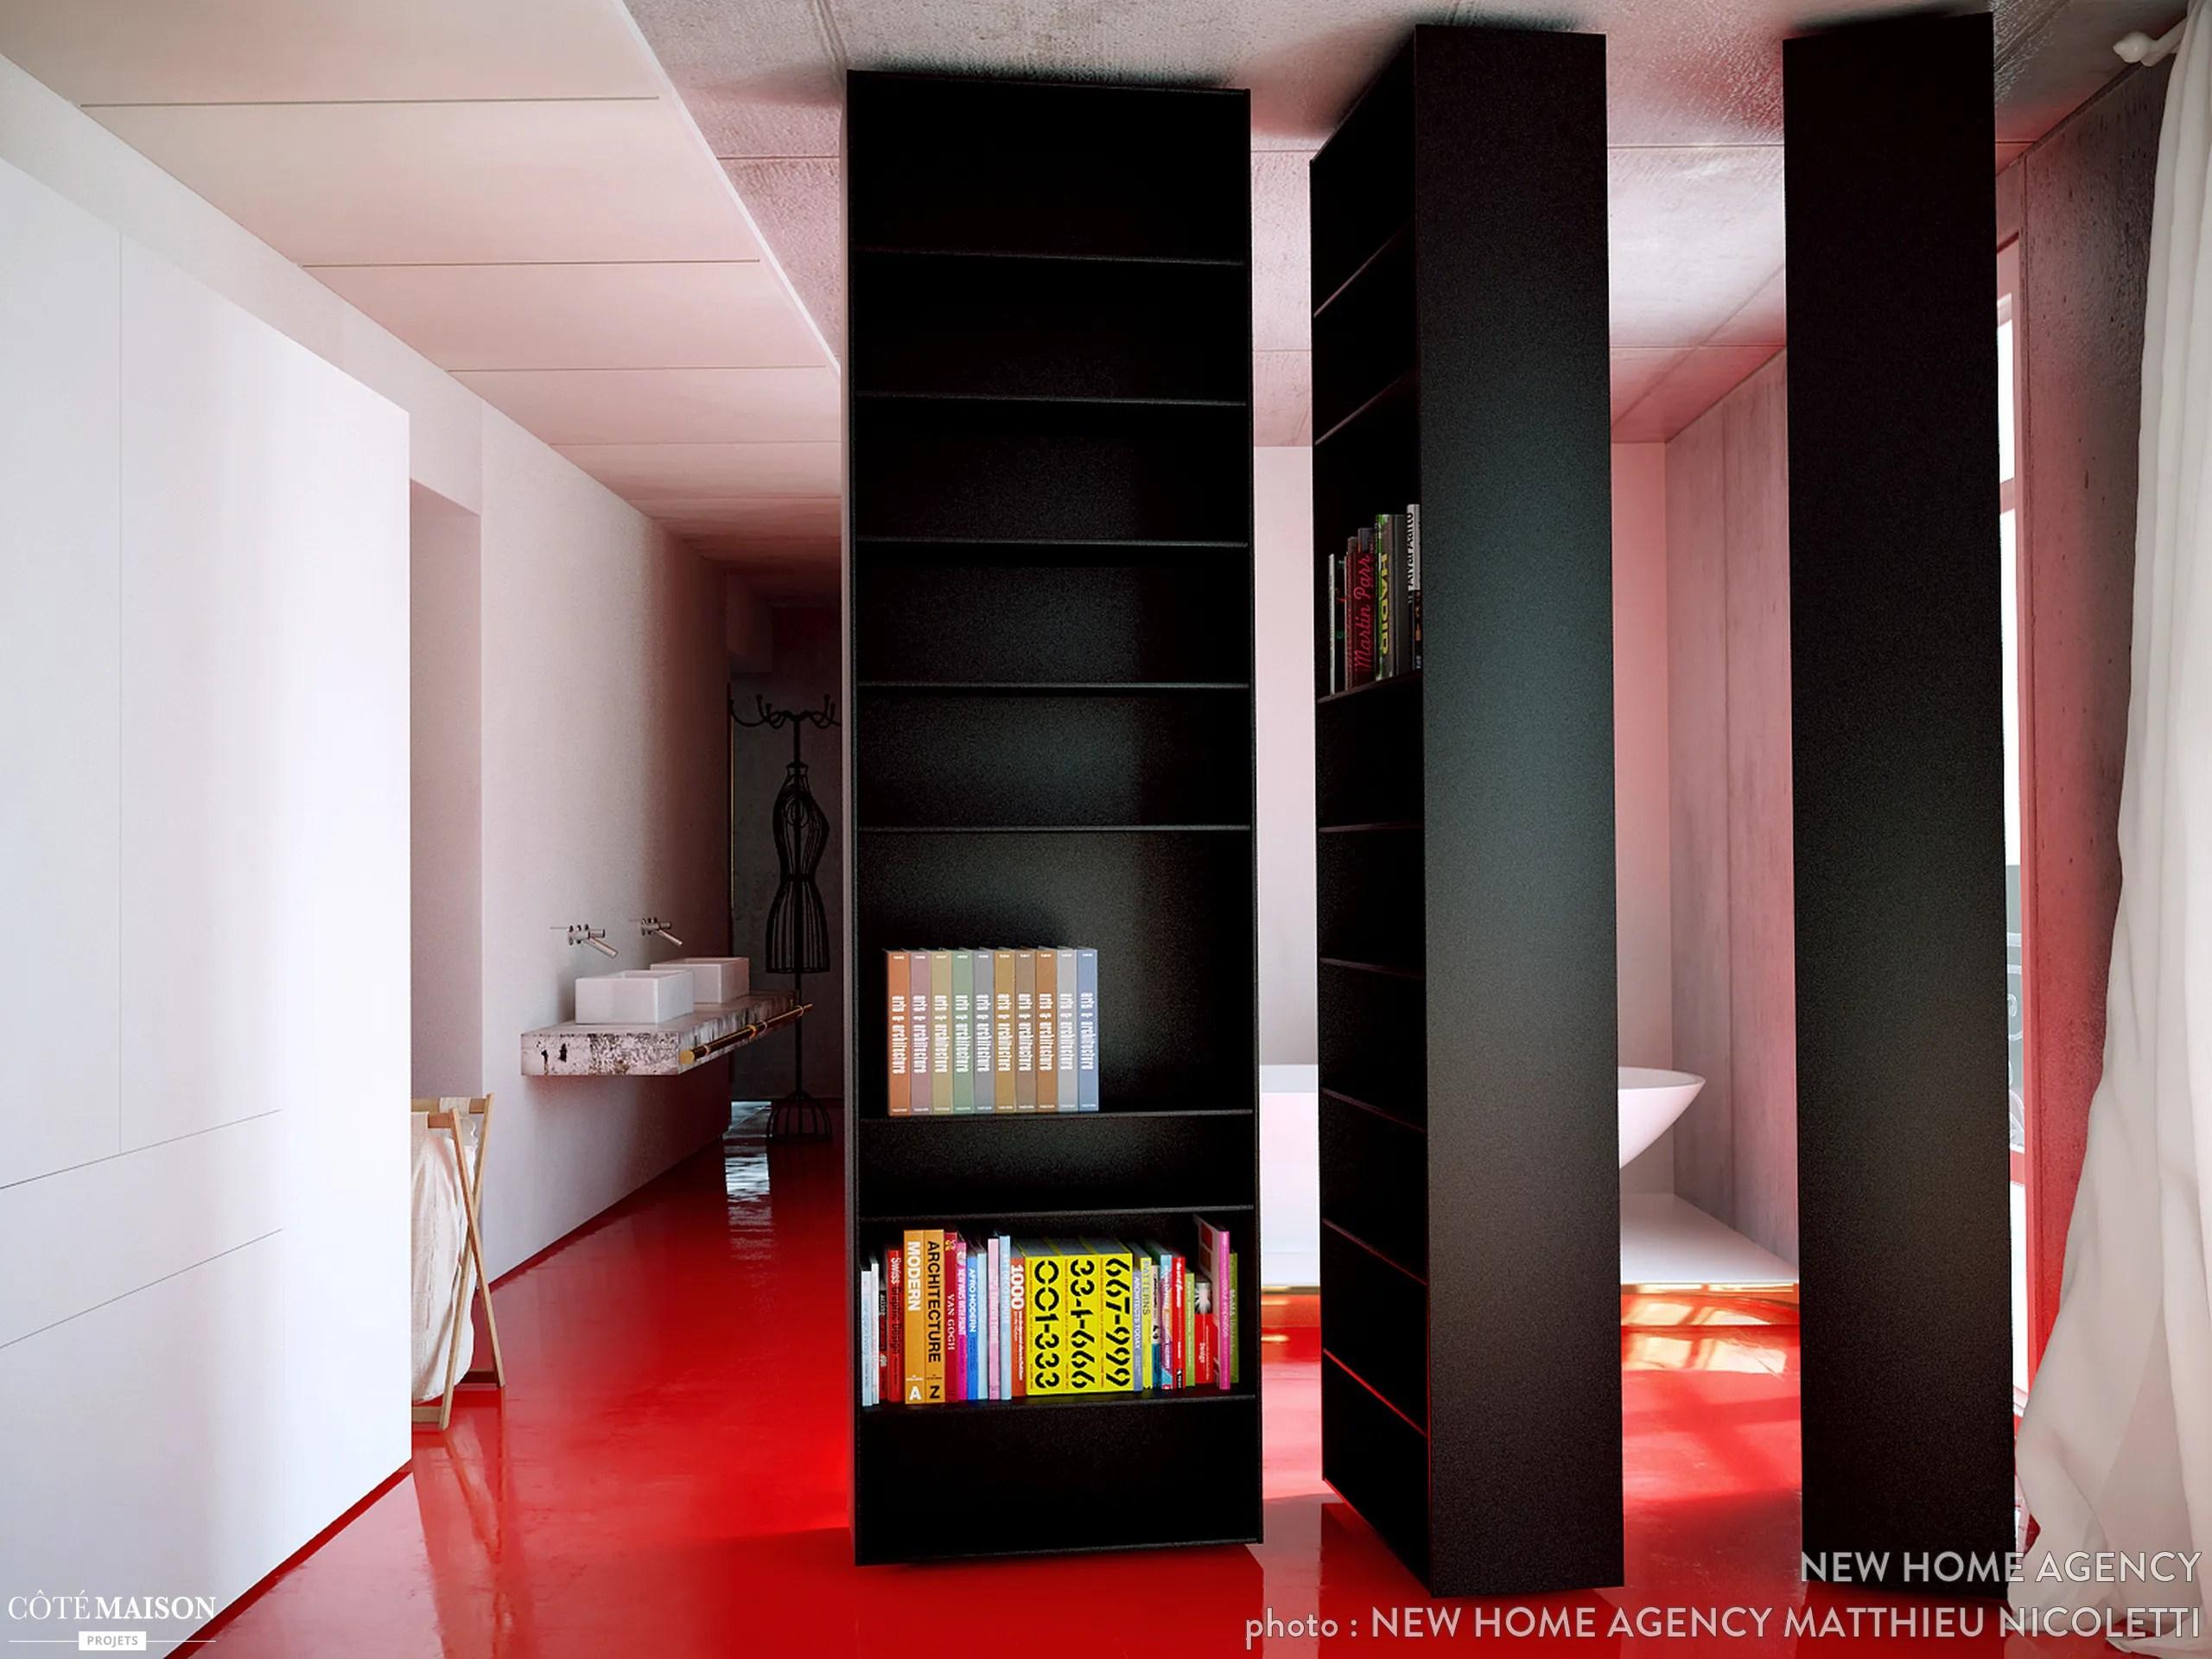 90 m2 rnovs en Kubrick style new home agency  Ct Maison